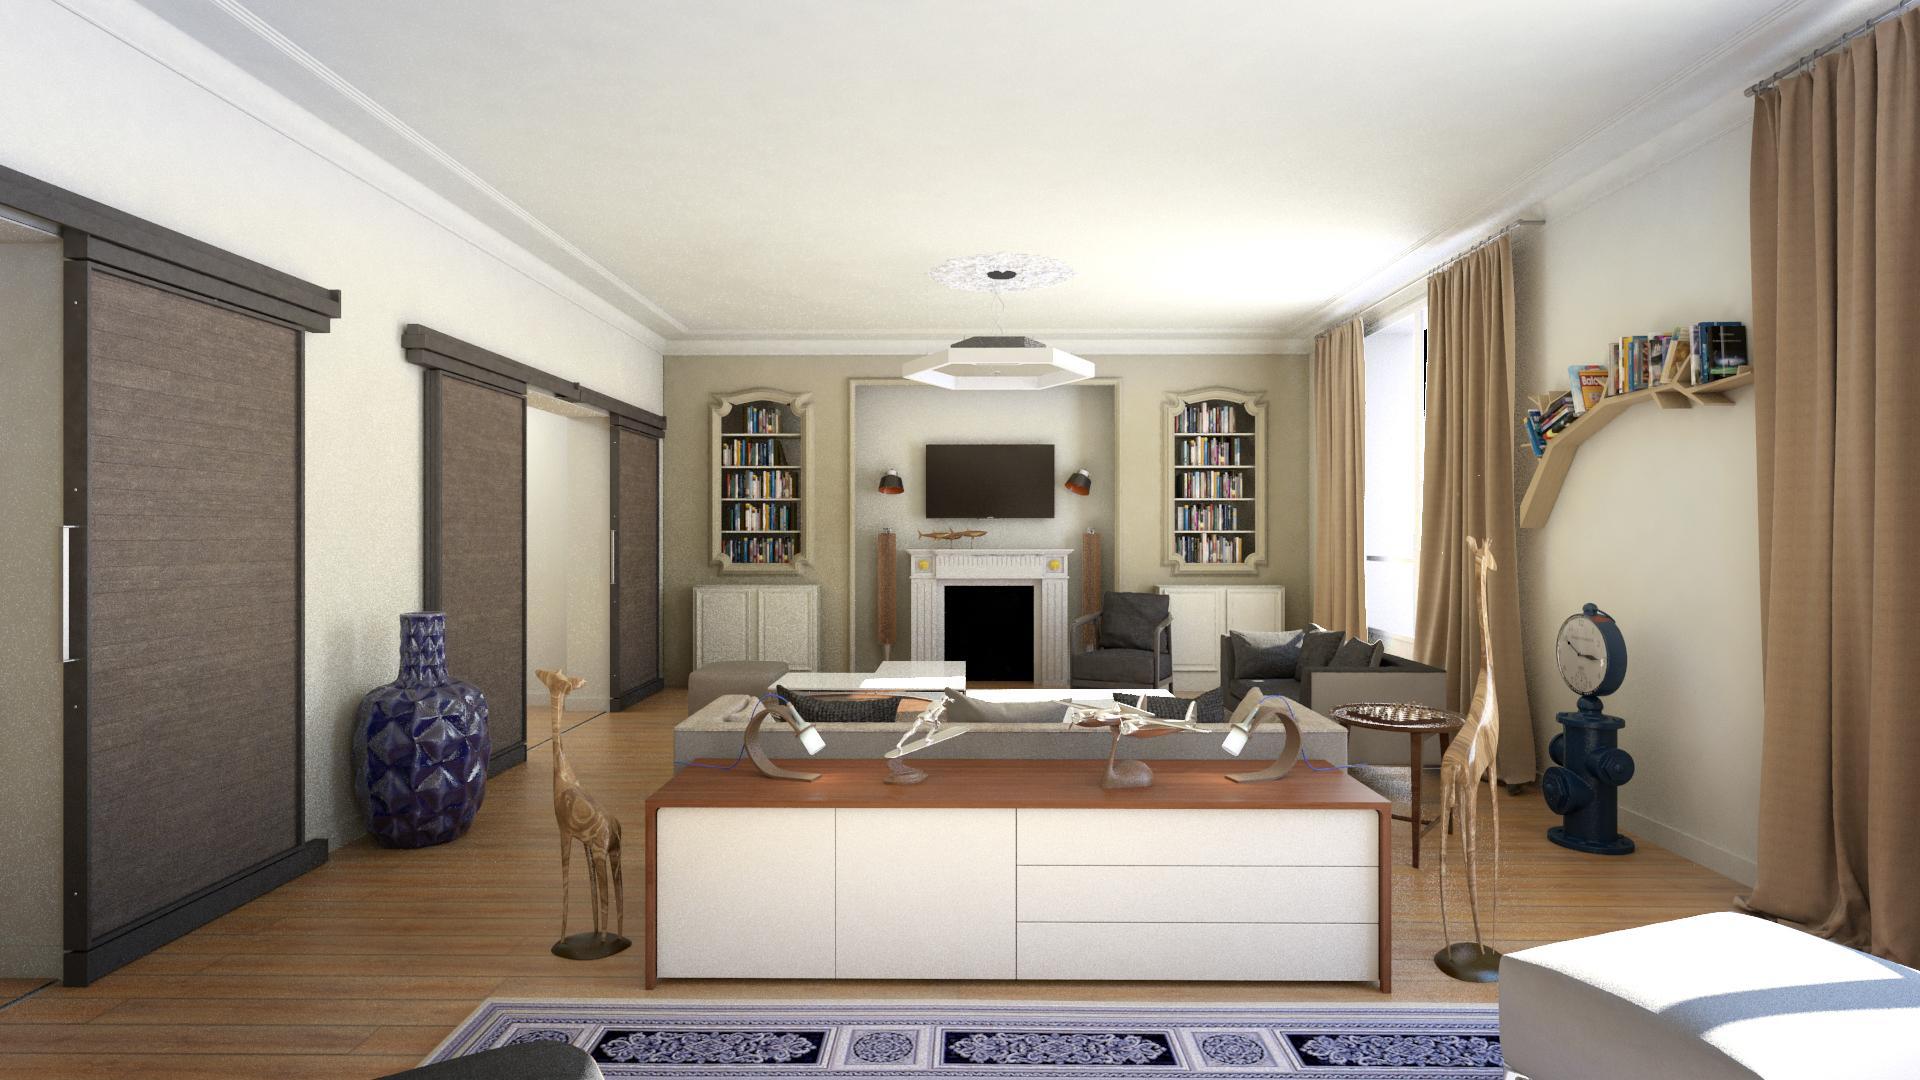 home staging 3d 187m paris atj graphics. Black Bedroom Furniture Sets. Home Design Ideas